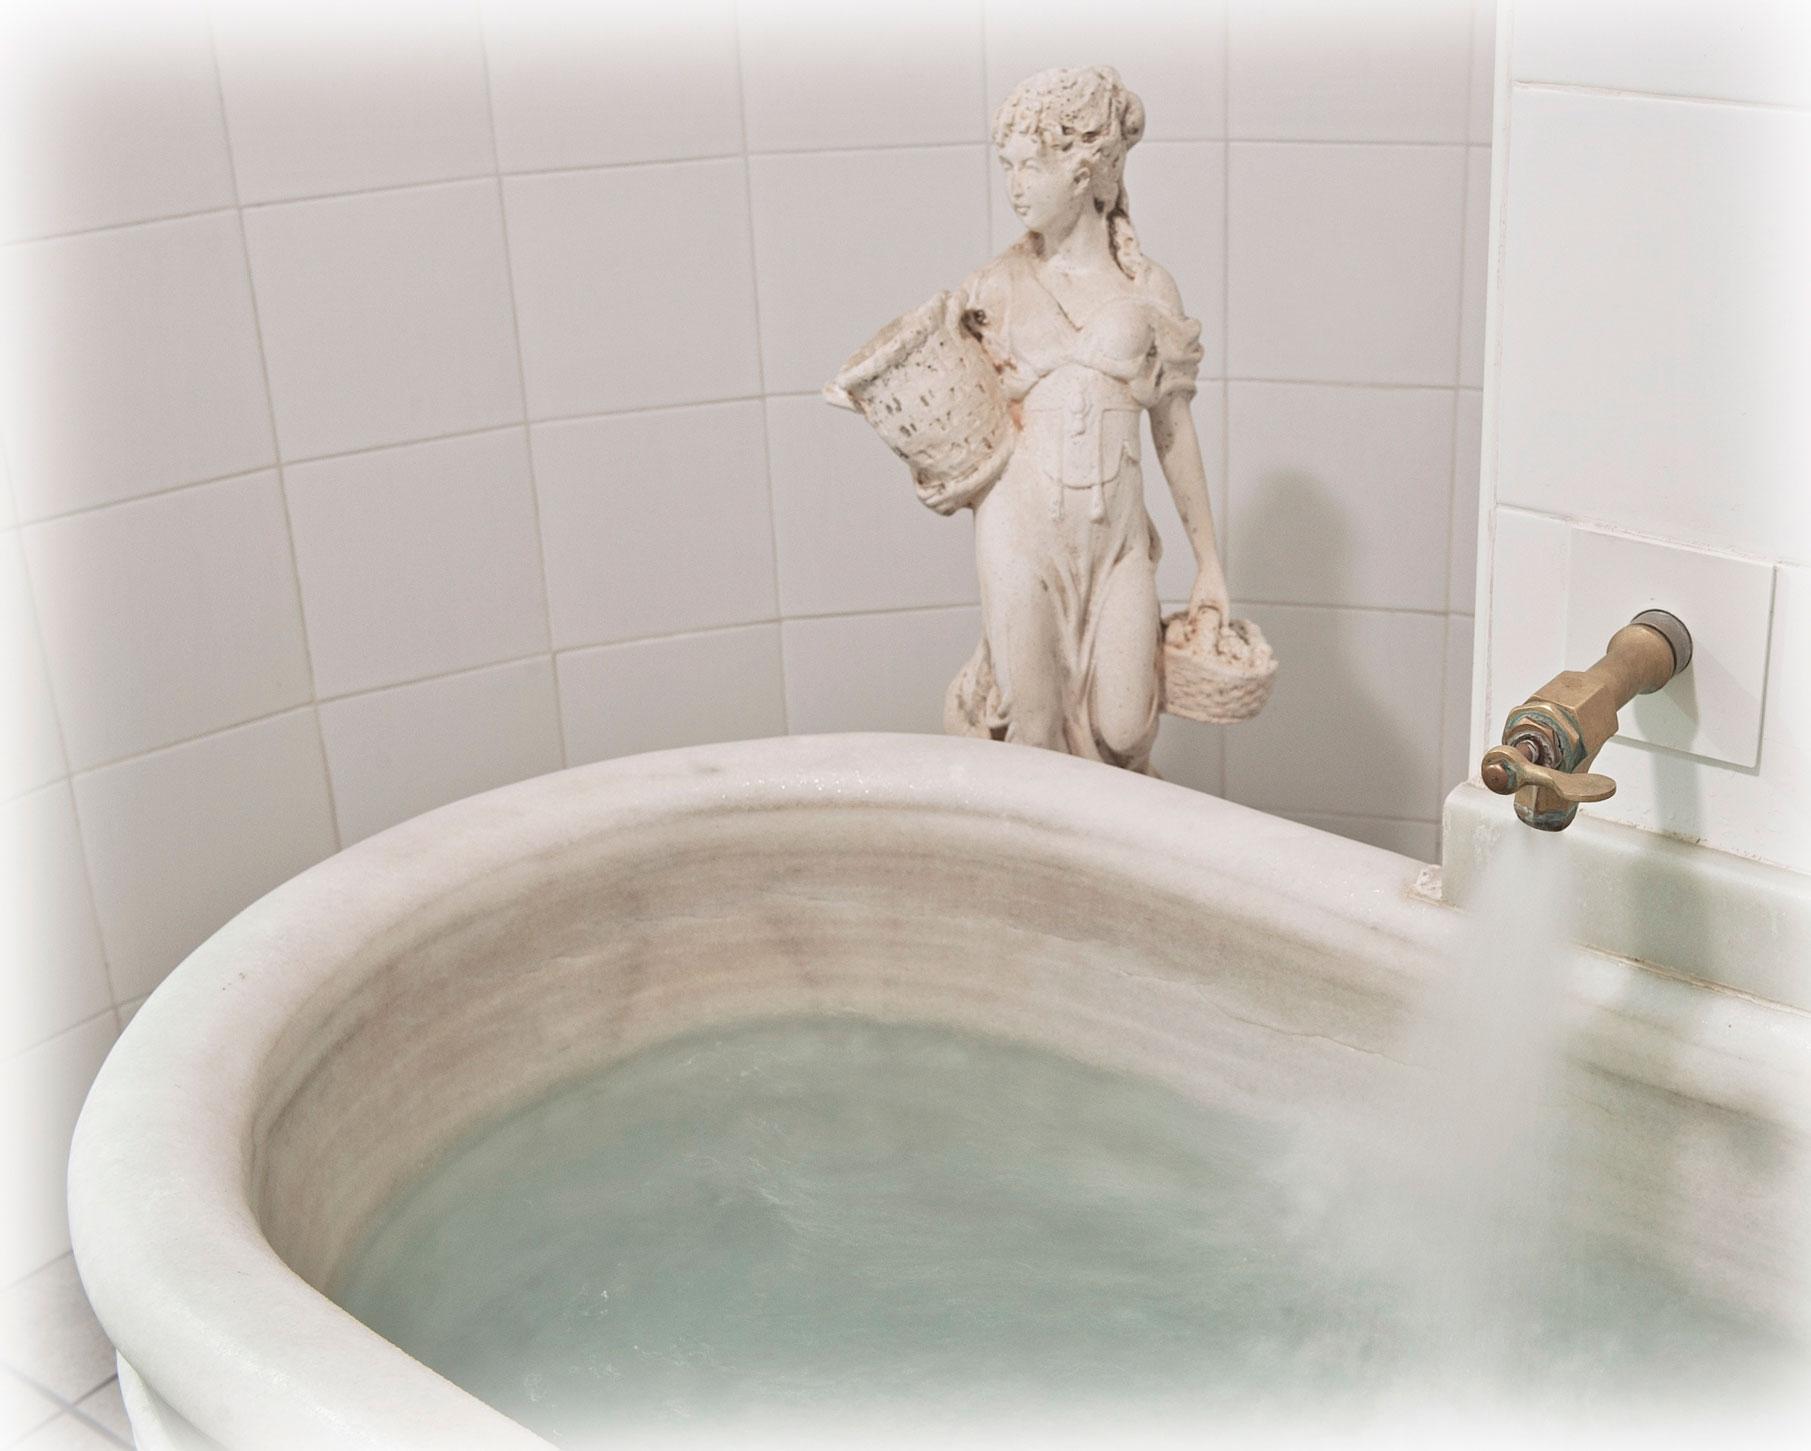 Bañera del 1850